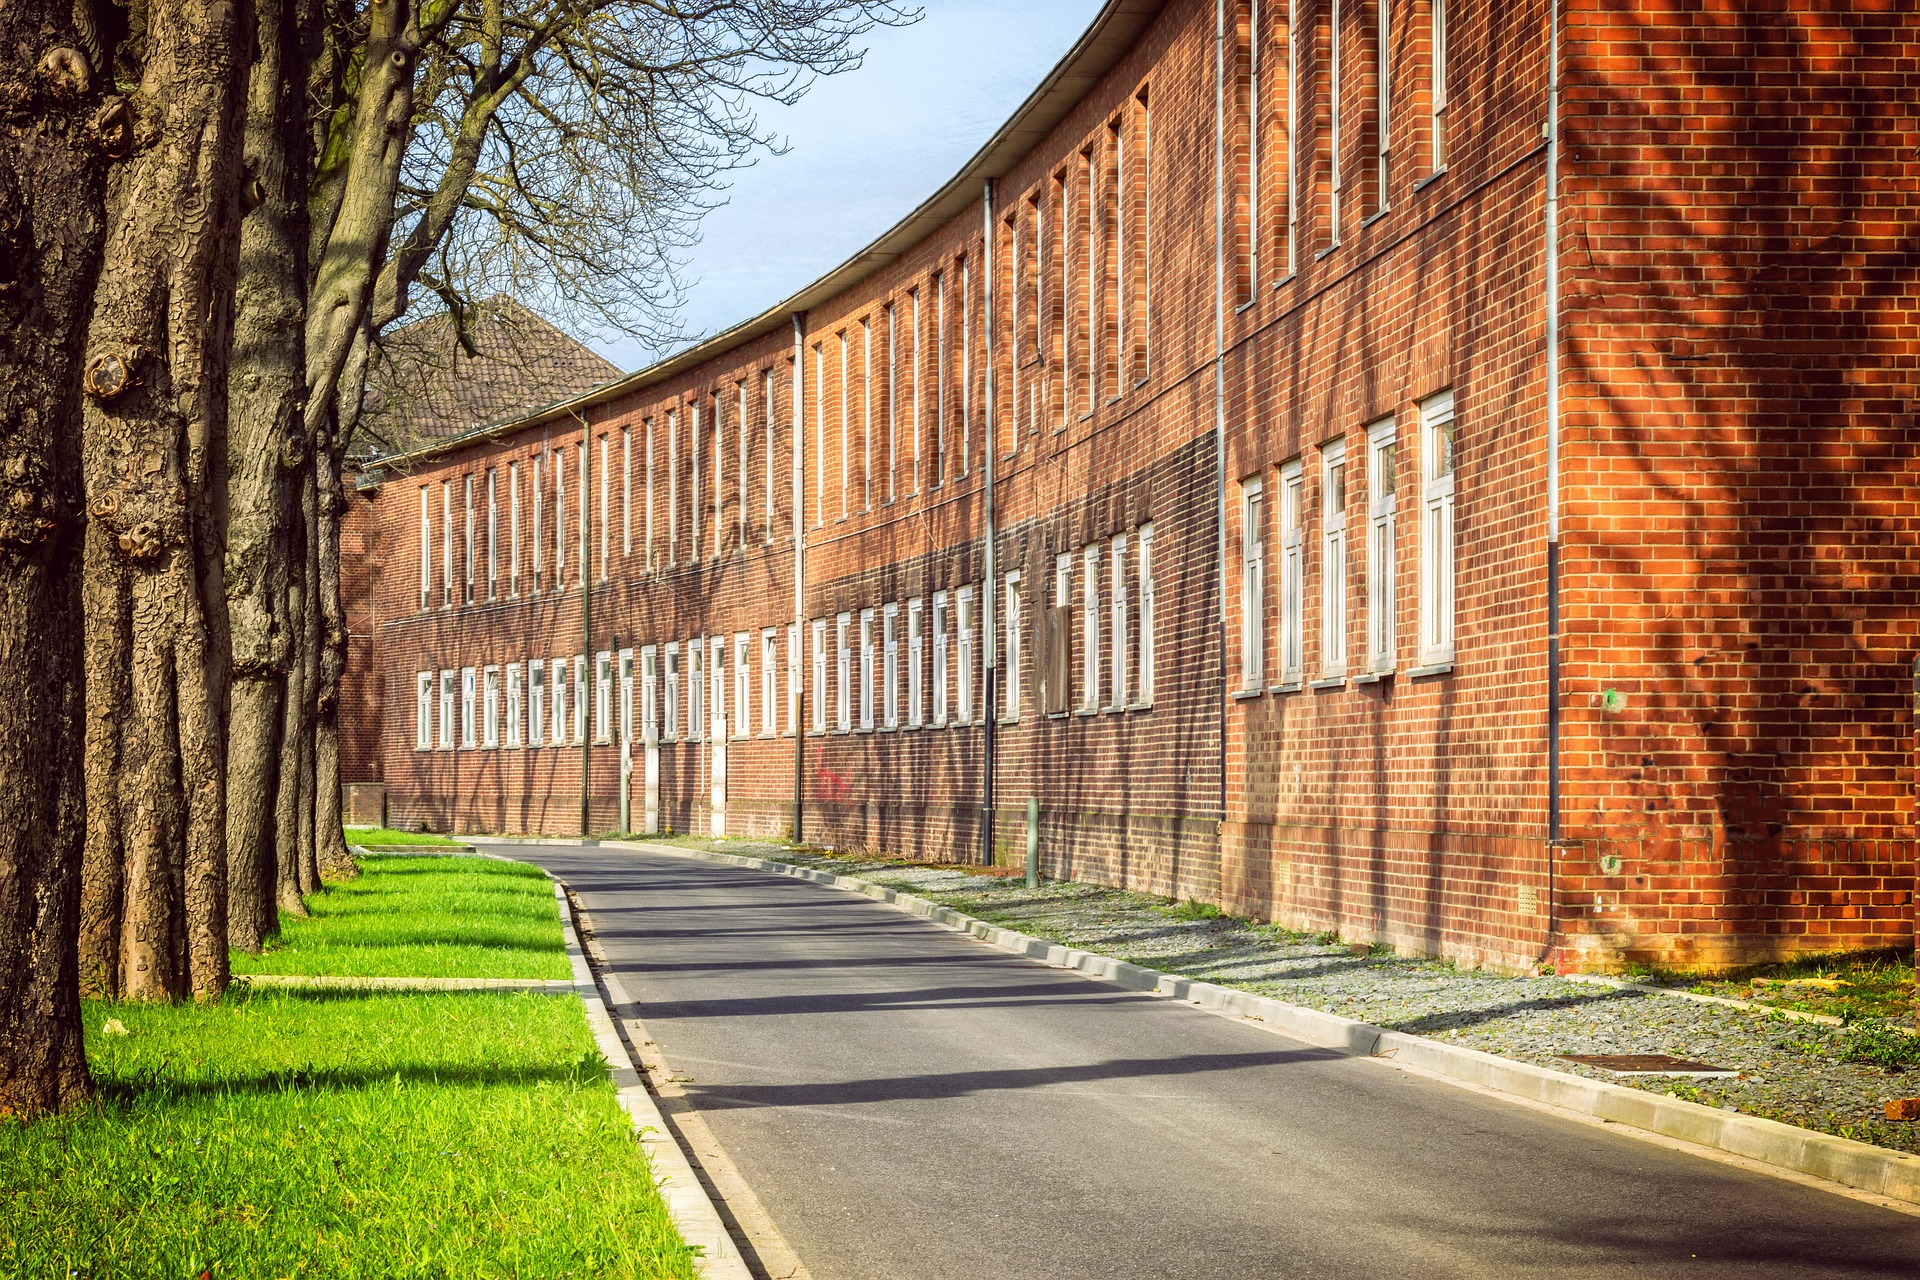 Edificios de ladrillo visto / Pixabay